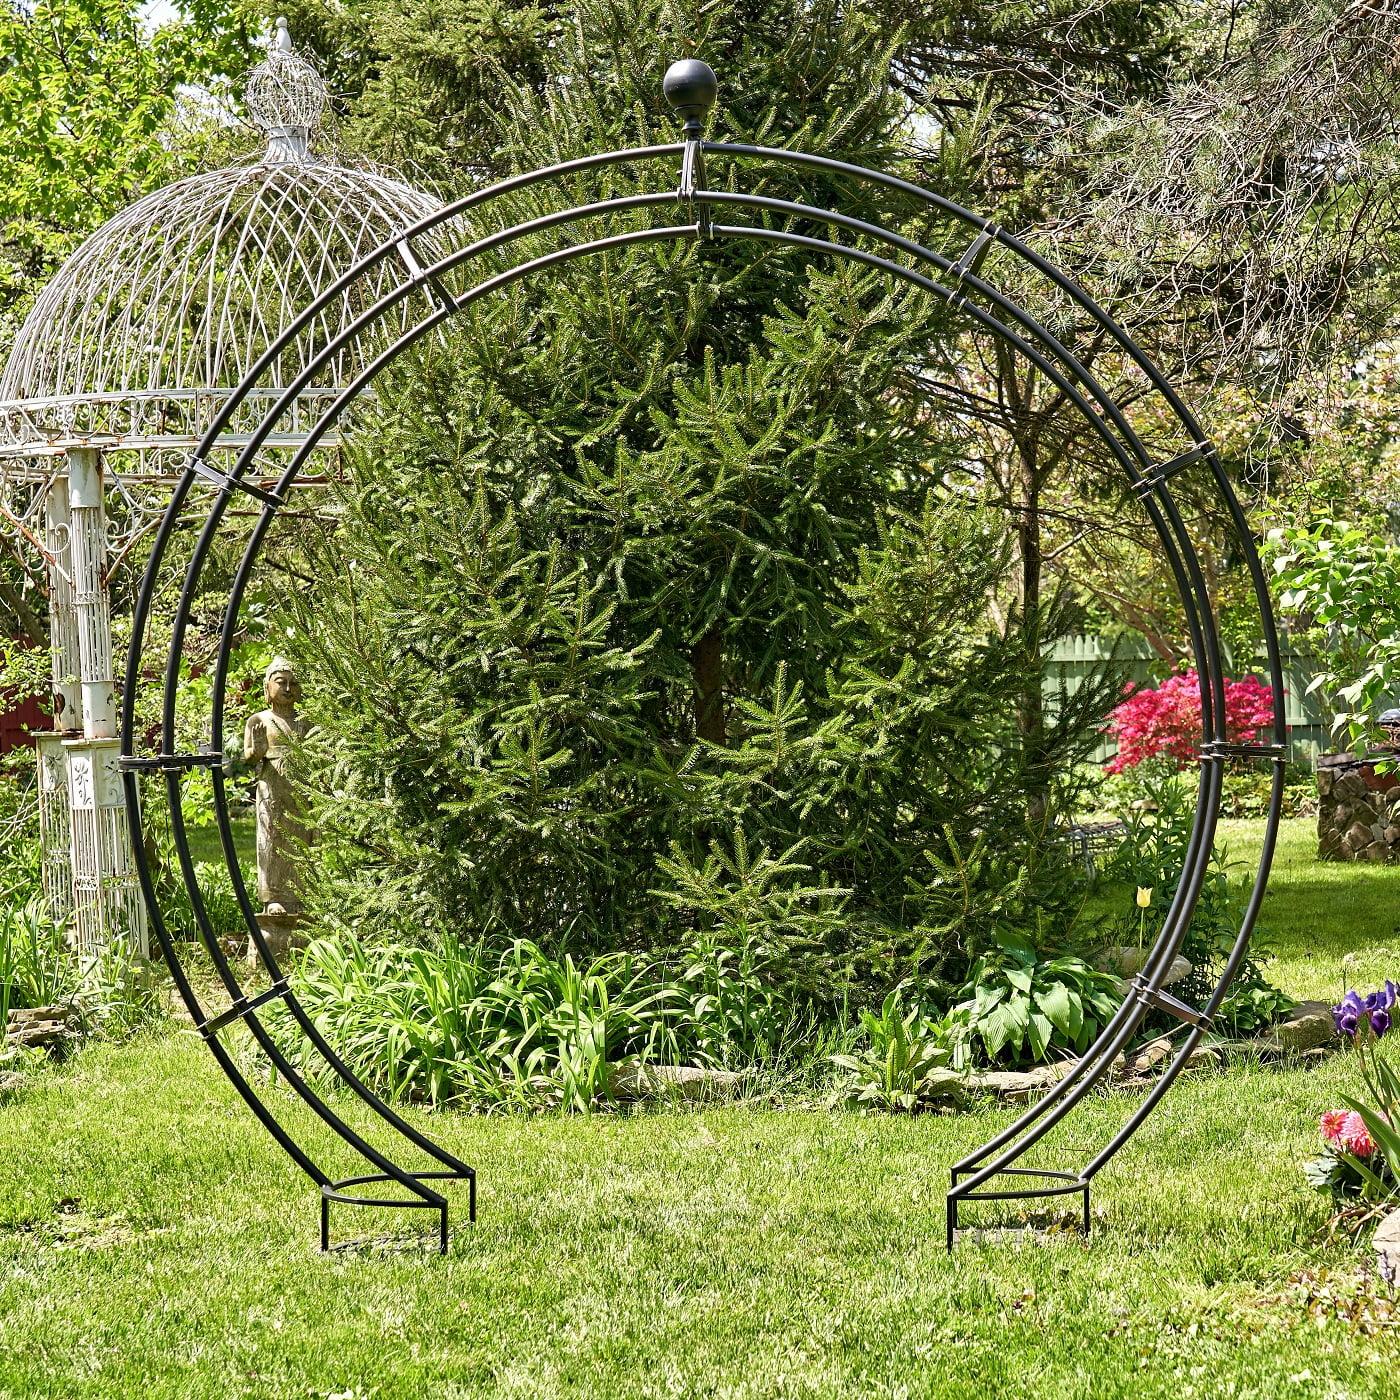 Unique Home and Garden Decor